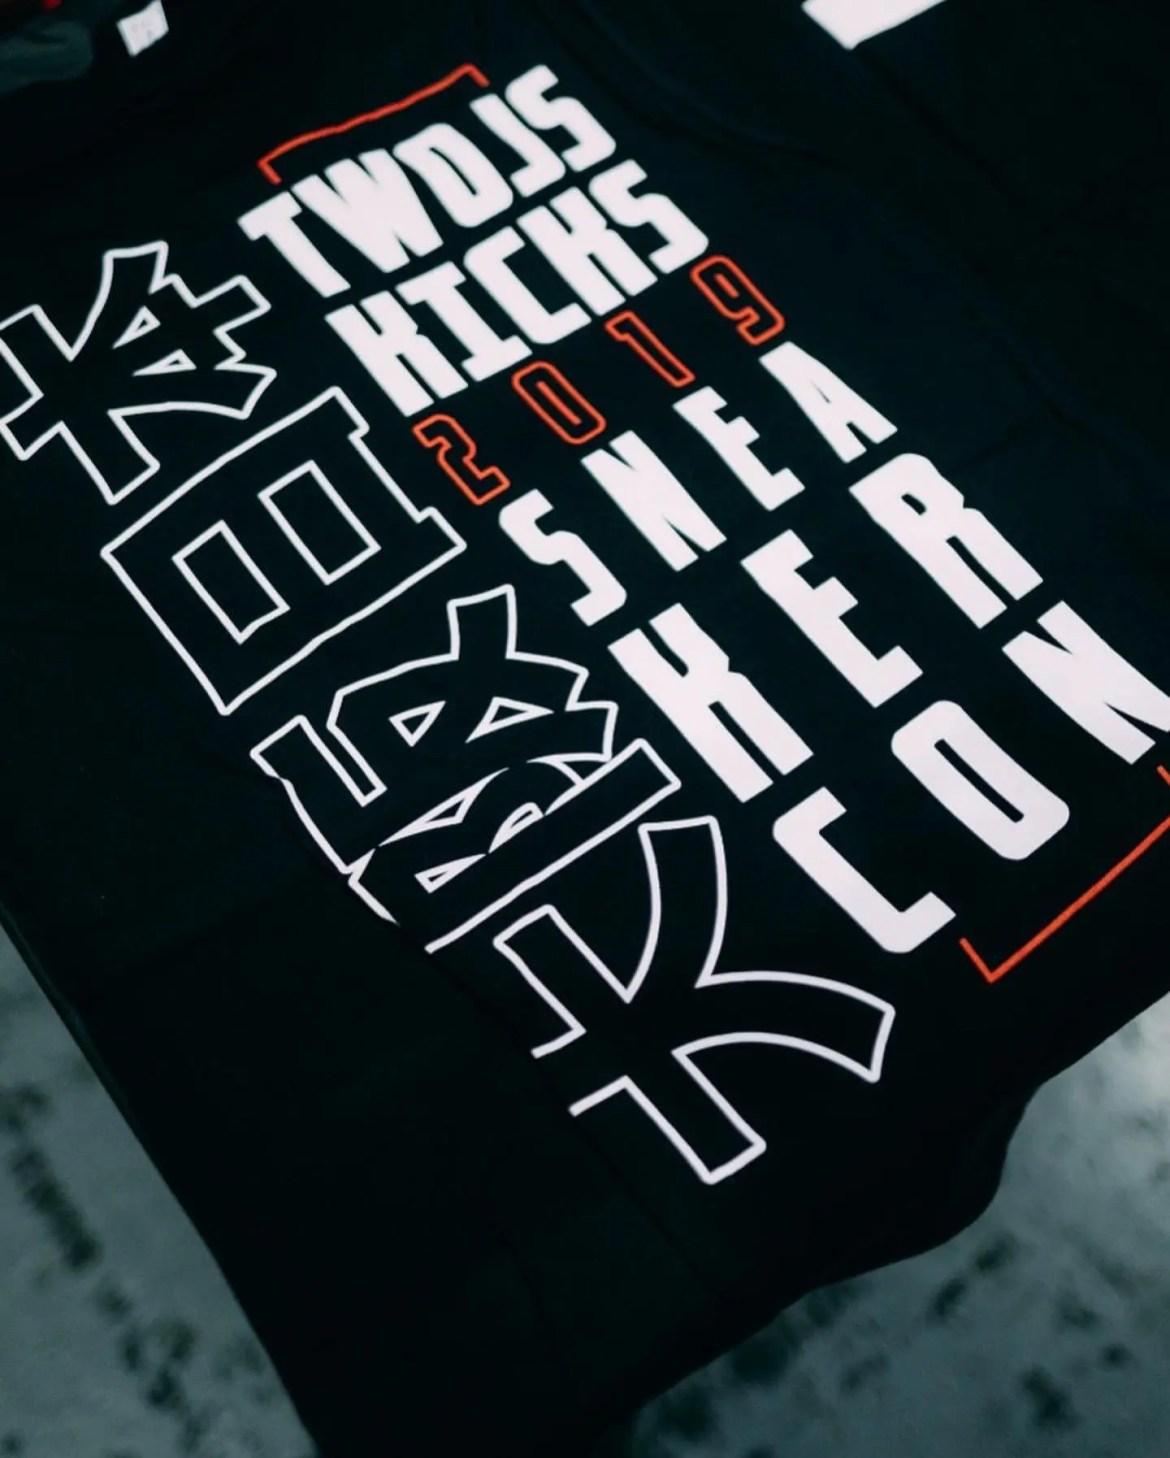 Sneaker Con Osaka Japan Official 2019 スニーカーコン 大阪 日本 2019年 限定 グッズ アイテム 会場 Tシャツ Urban Necessities アーバン ネセシティ 時計